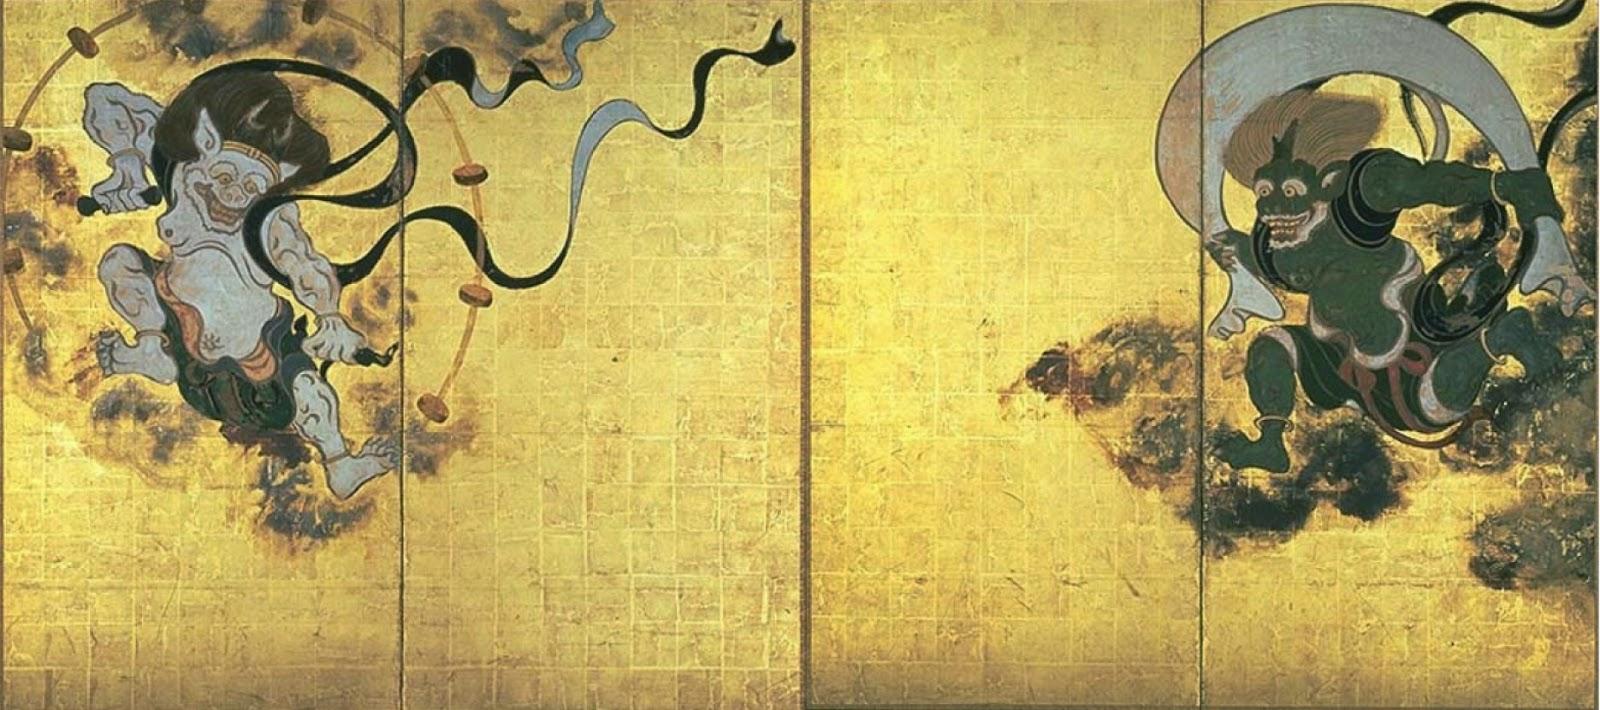 Fūjin-raijin-zu by Tawaraya Sōtatsu